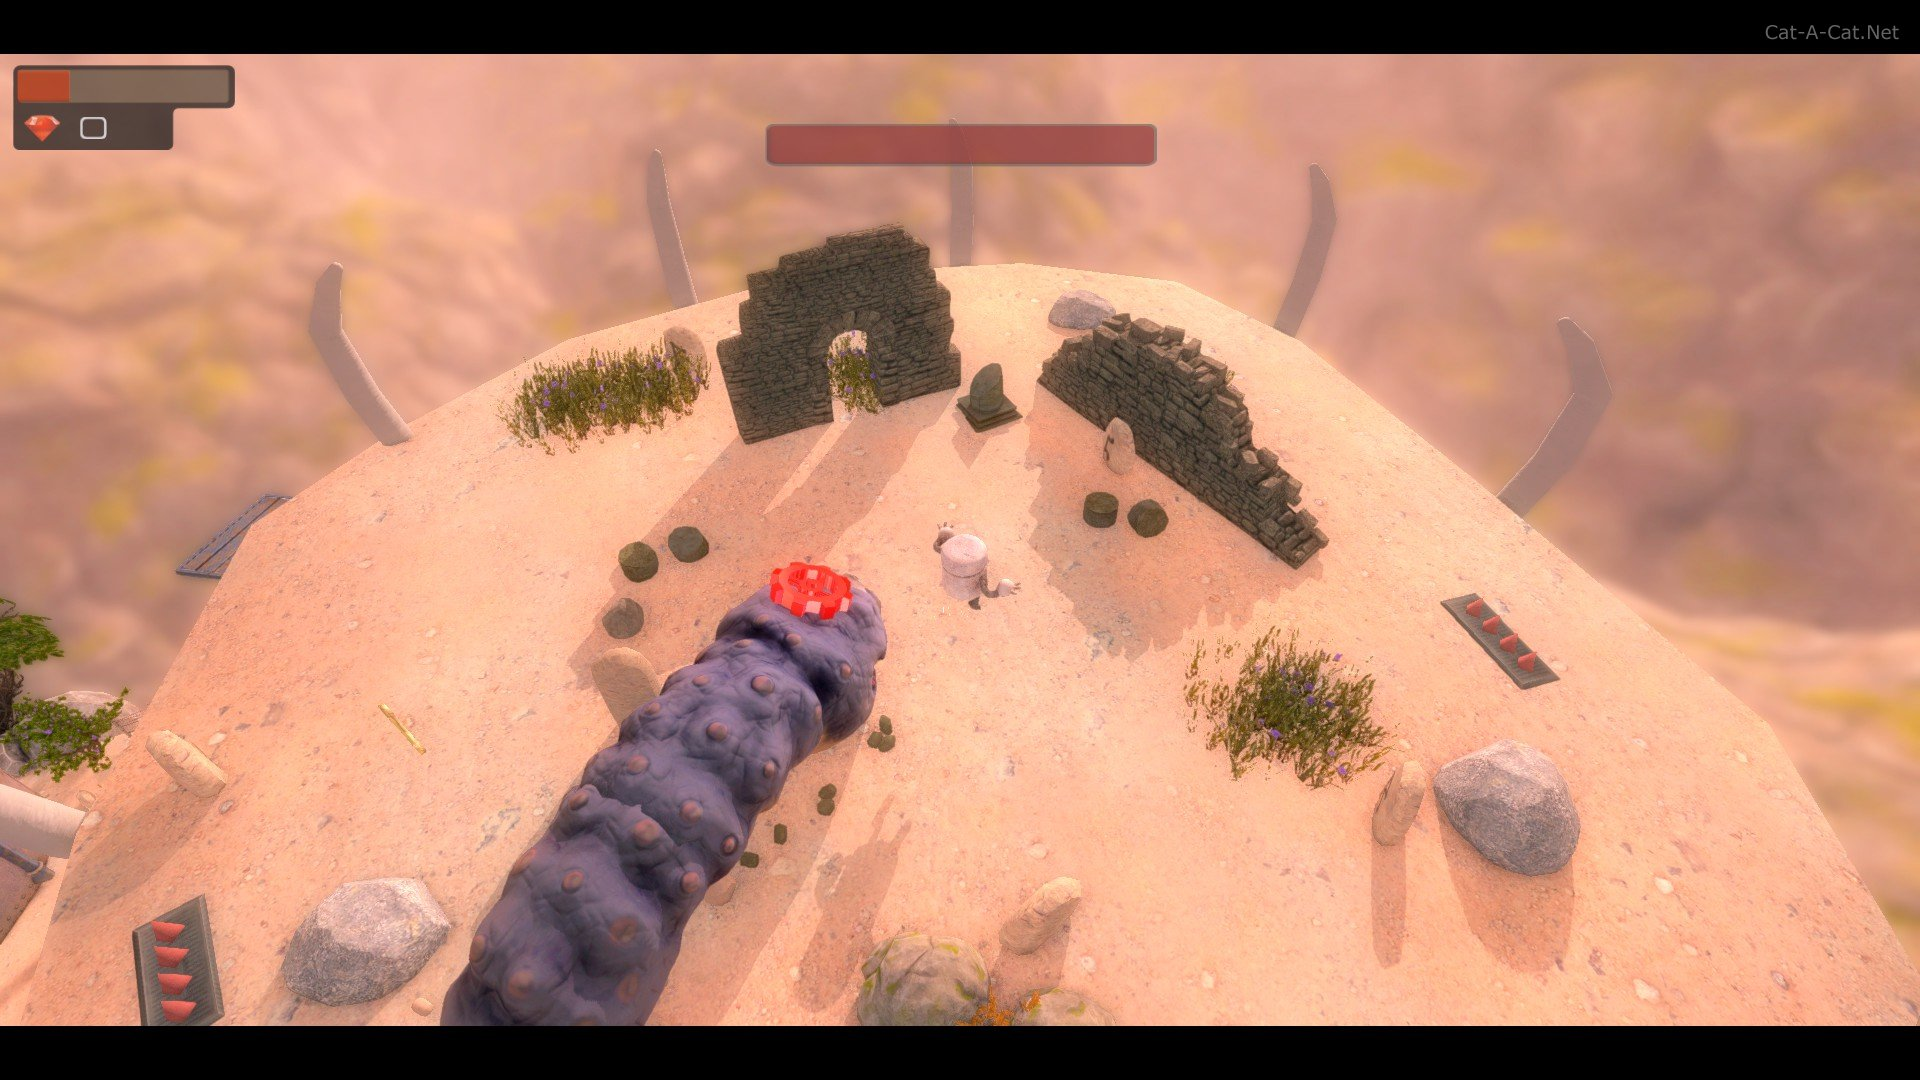 скачать игру plants vs zombies на андроид 4.0